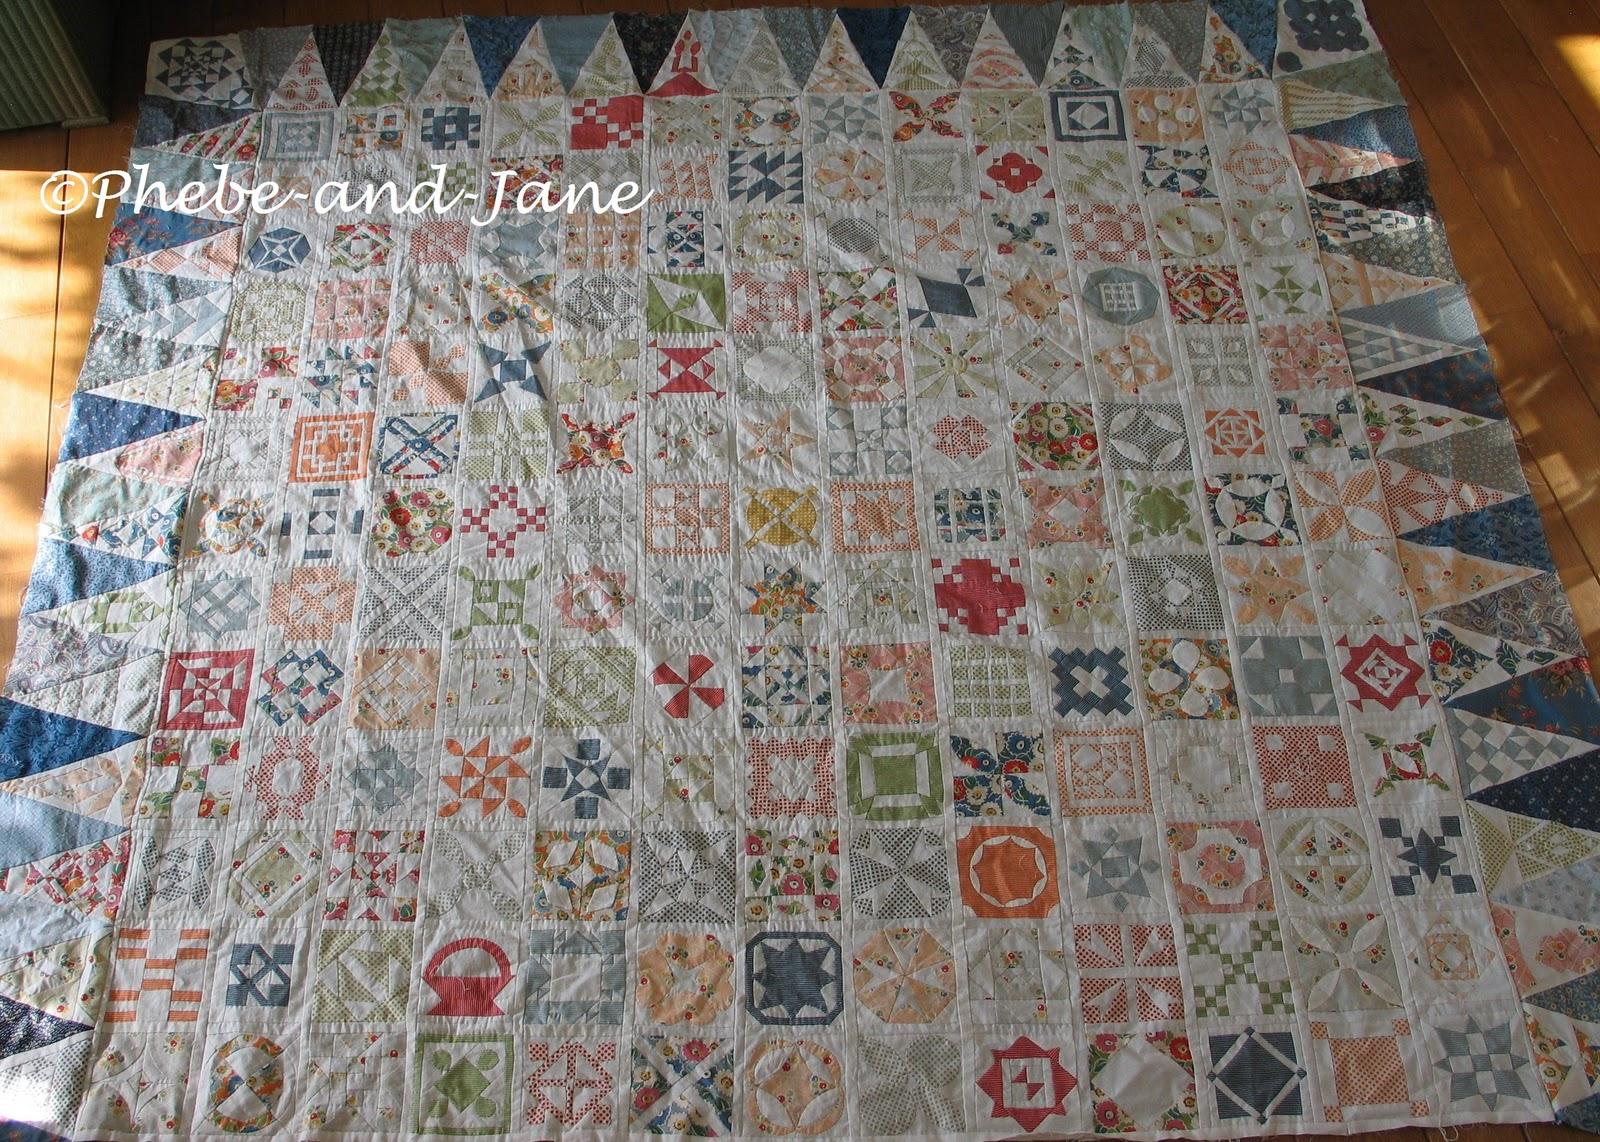 Quilten Startpagina Nl.Drie Driehoekranden Aan Mijn Dear Jane Quilt Quilten